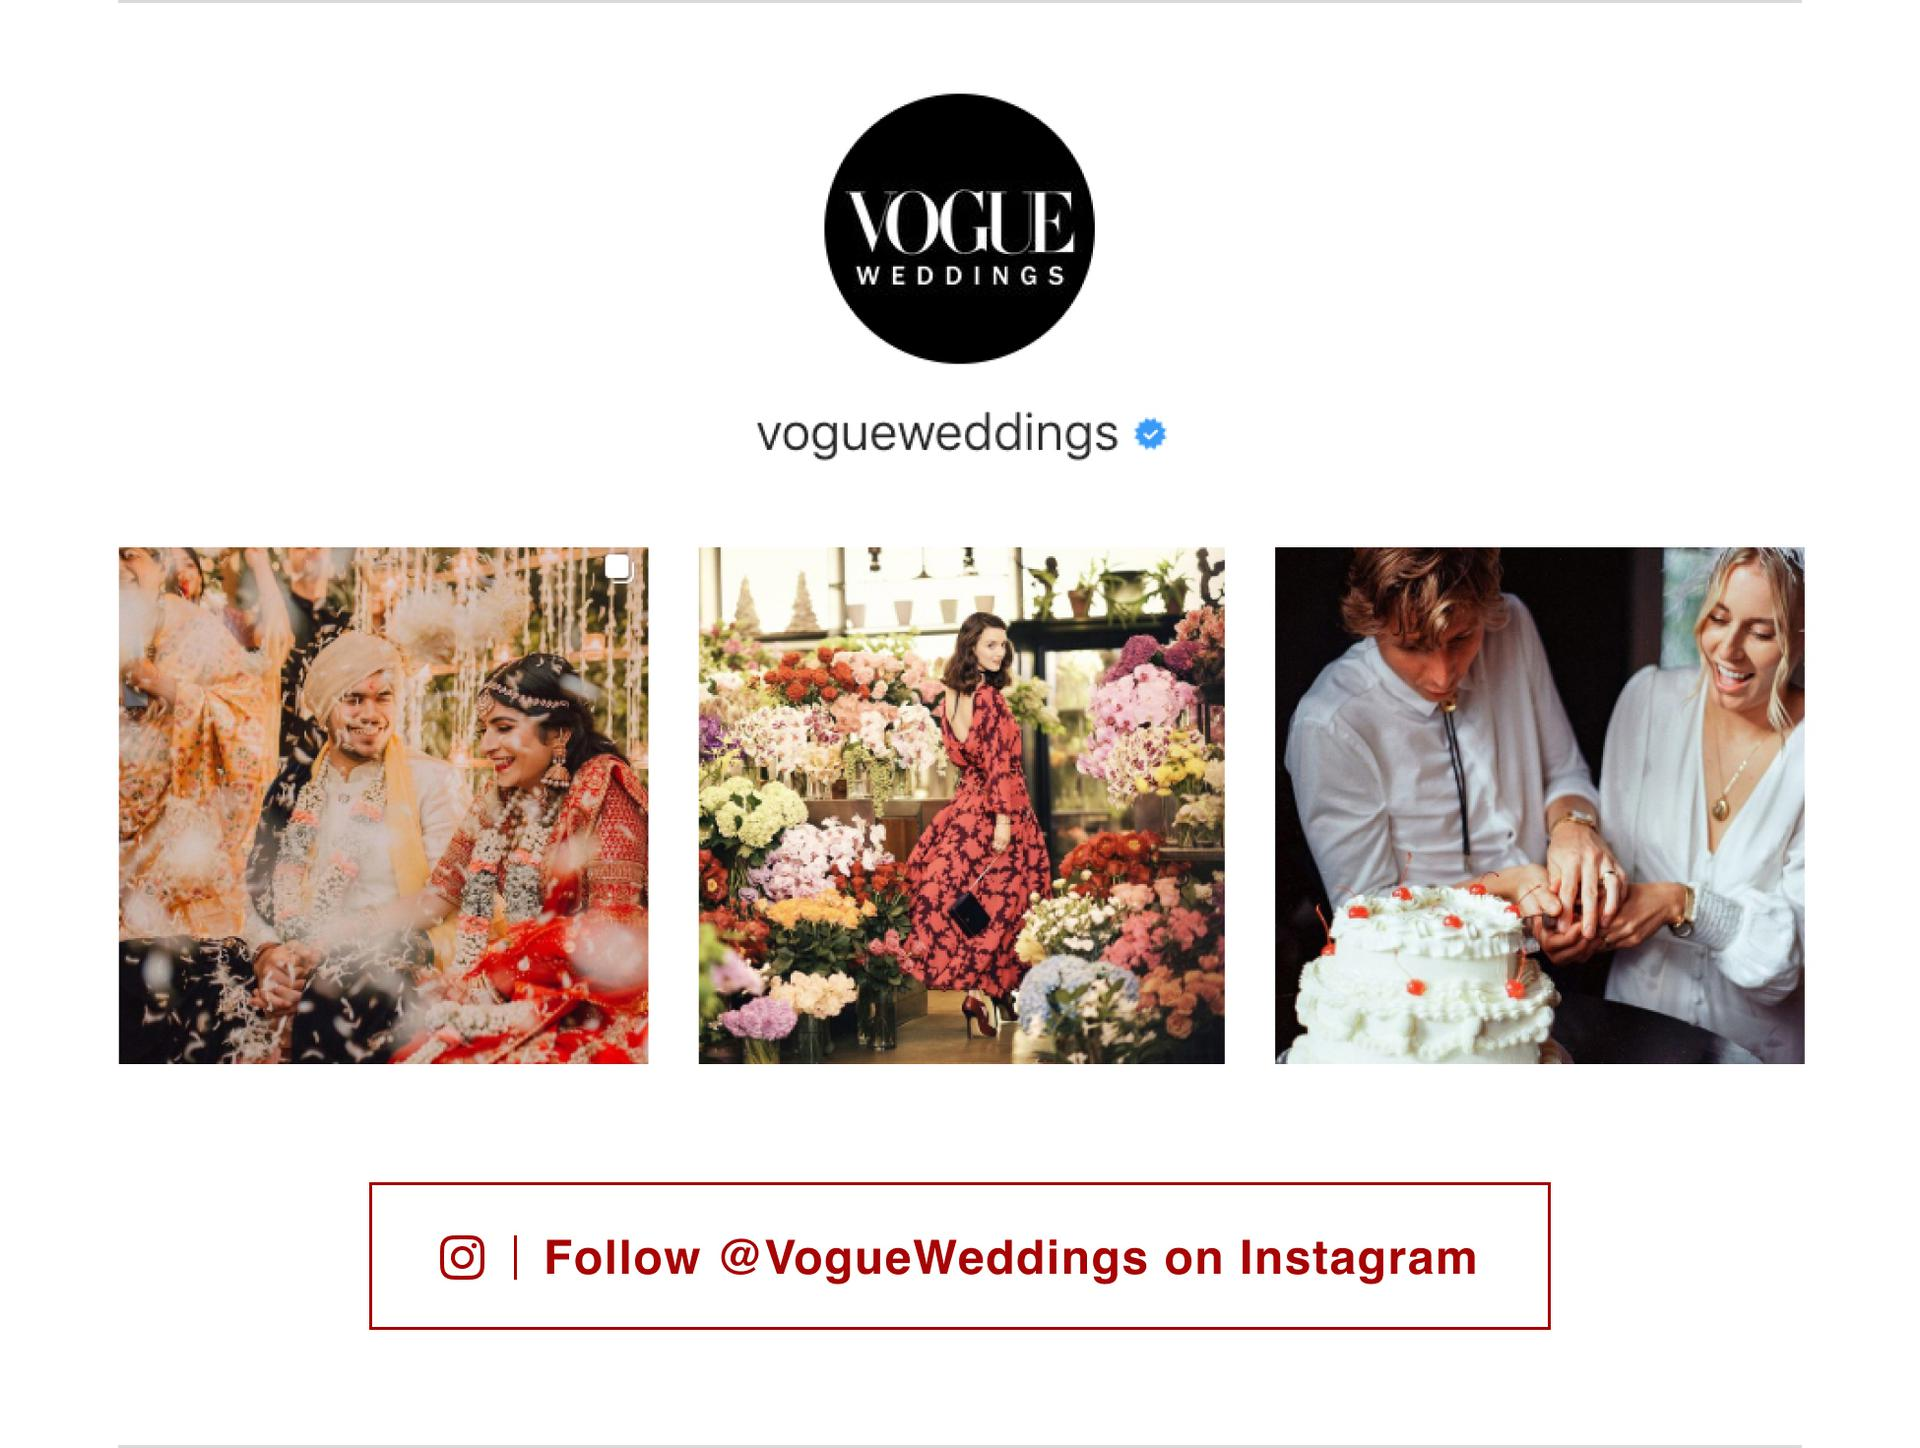 Follow Vogue Weddings on Instagram